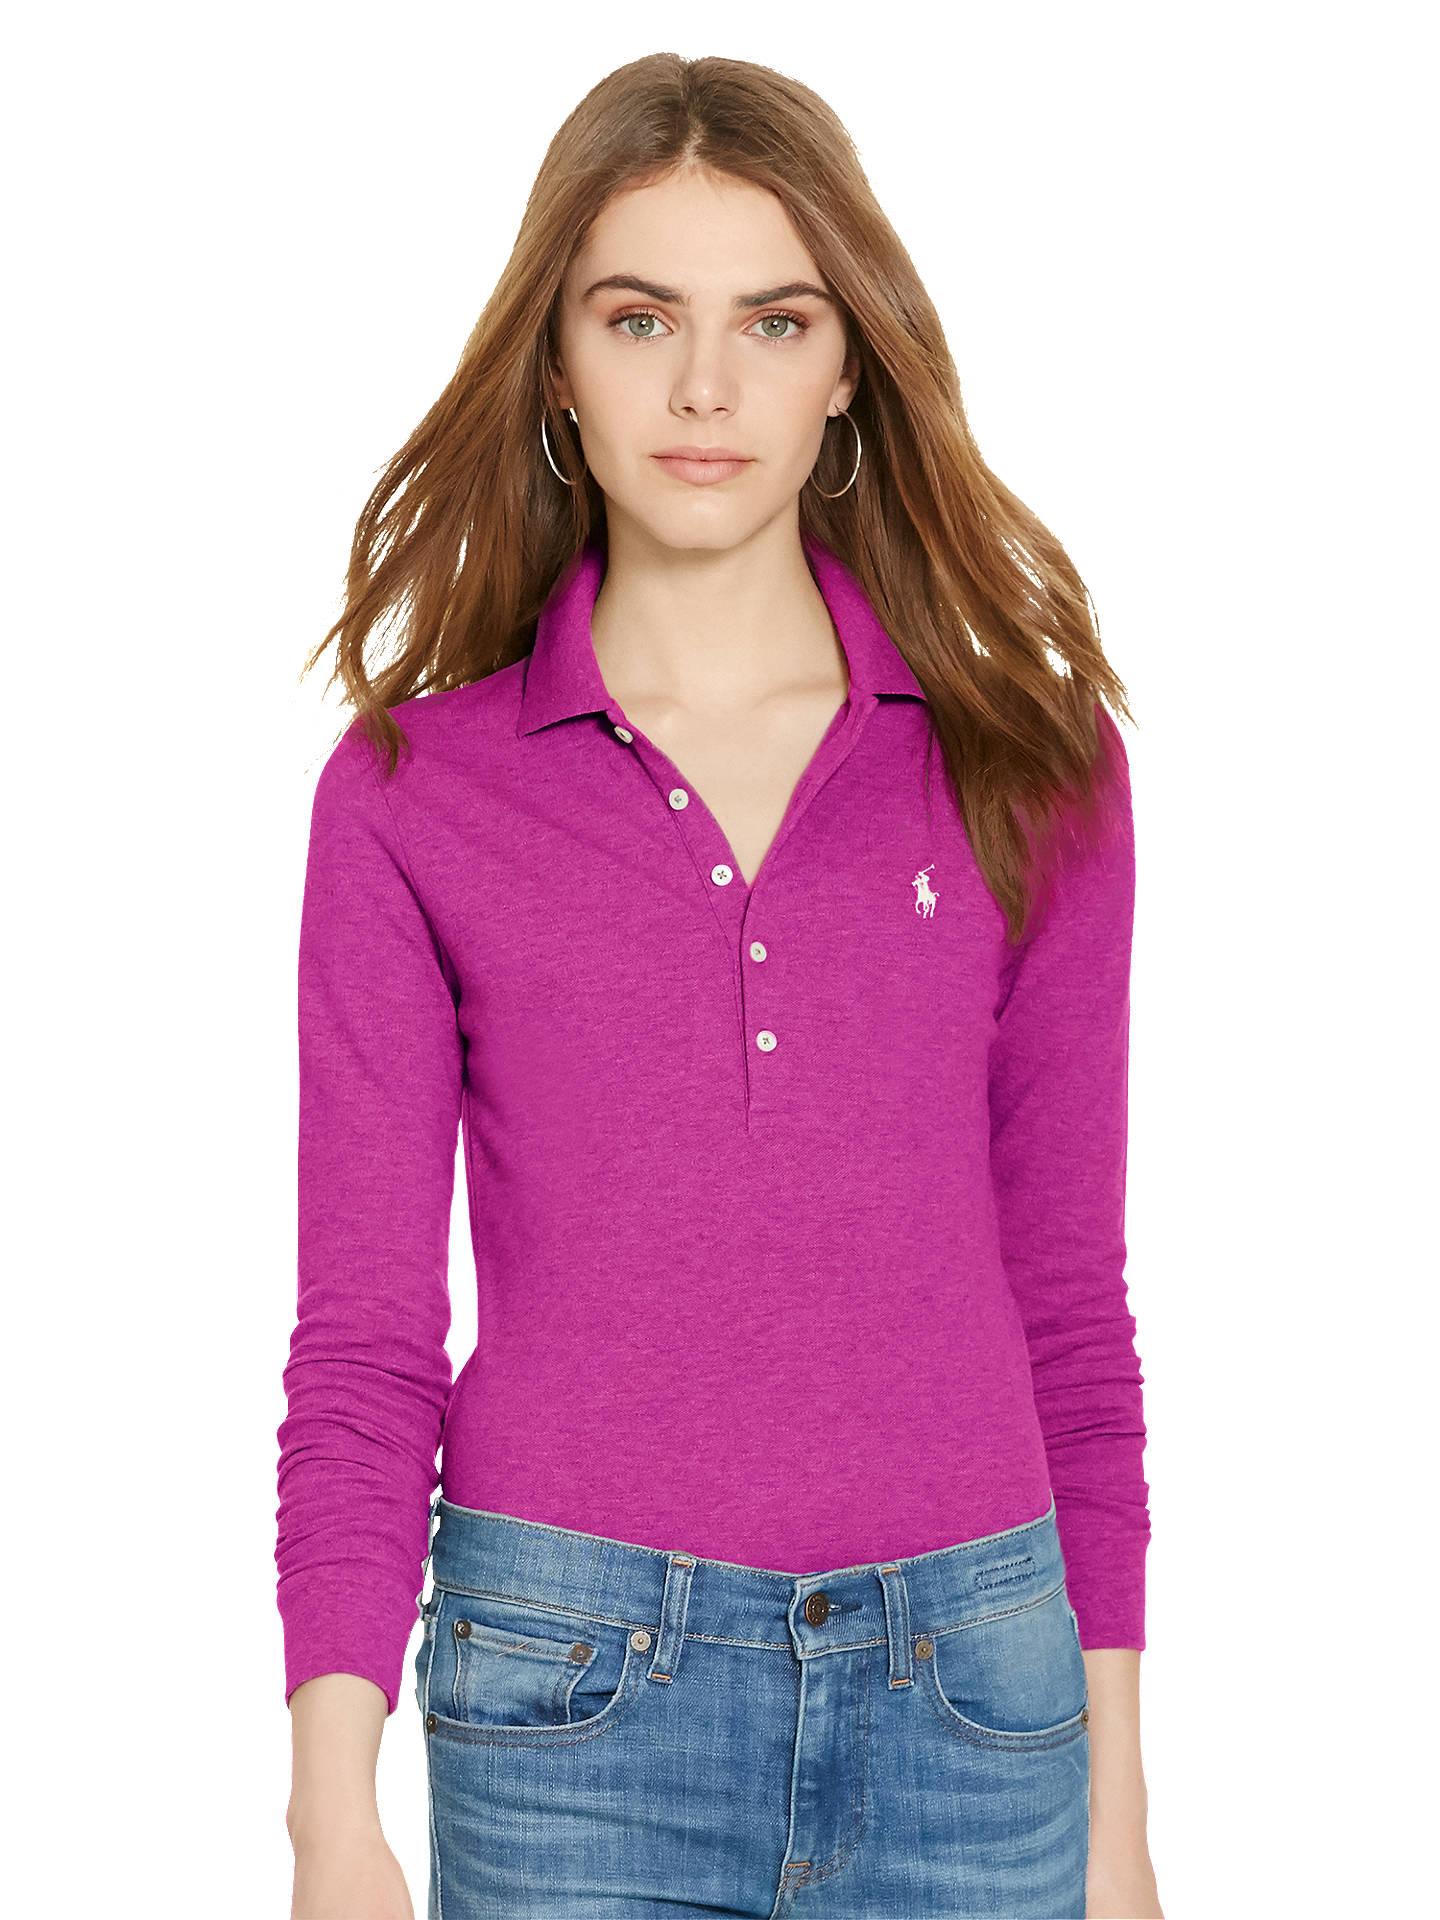 Sleeve Lauren Julie Skinny Stretch Polo Long Shirt Ralph Fit eWdrCxBo